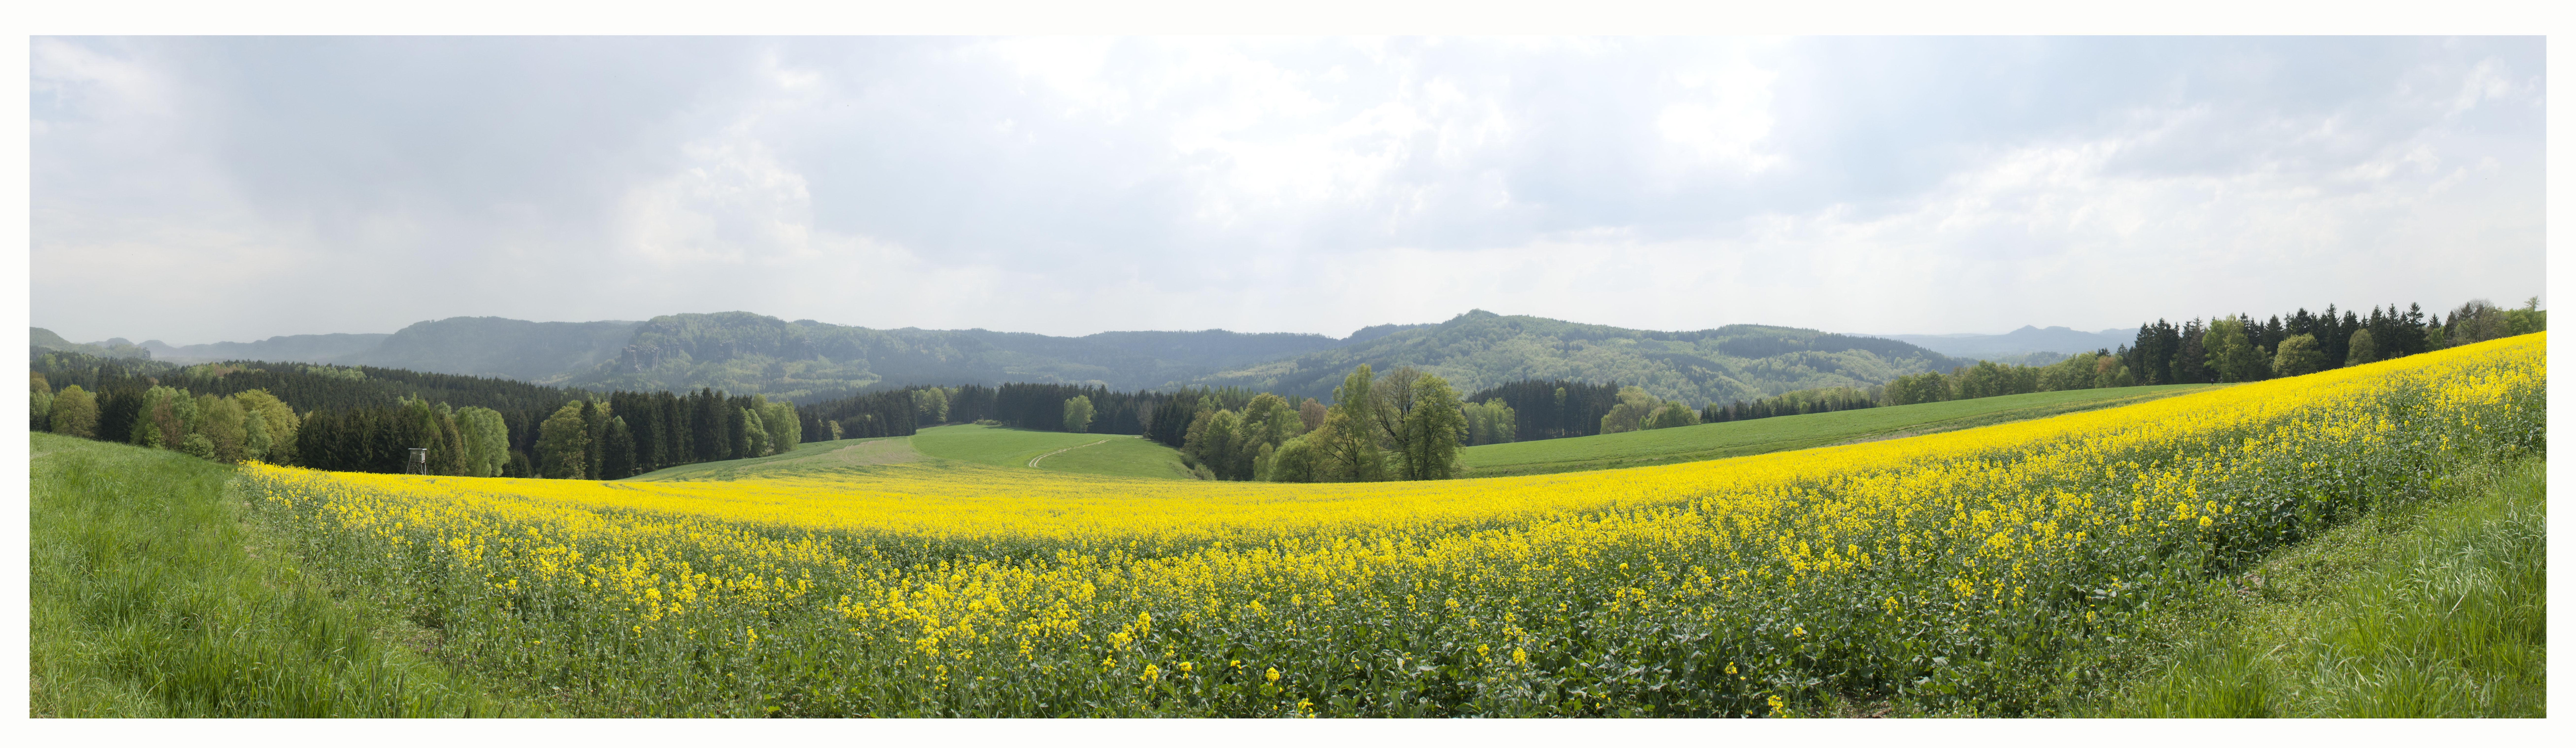 Frühling - Rapsfeld